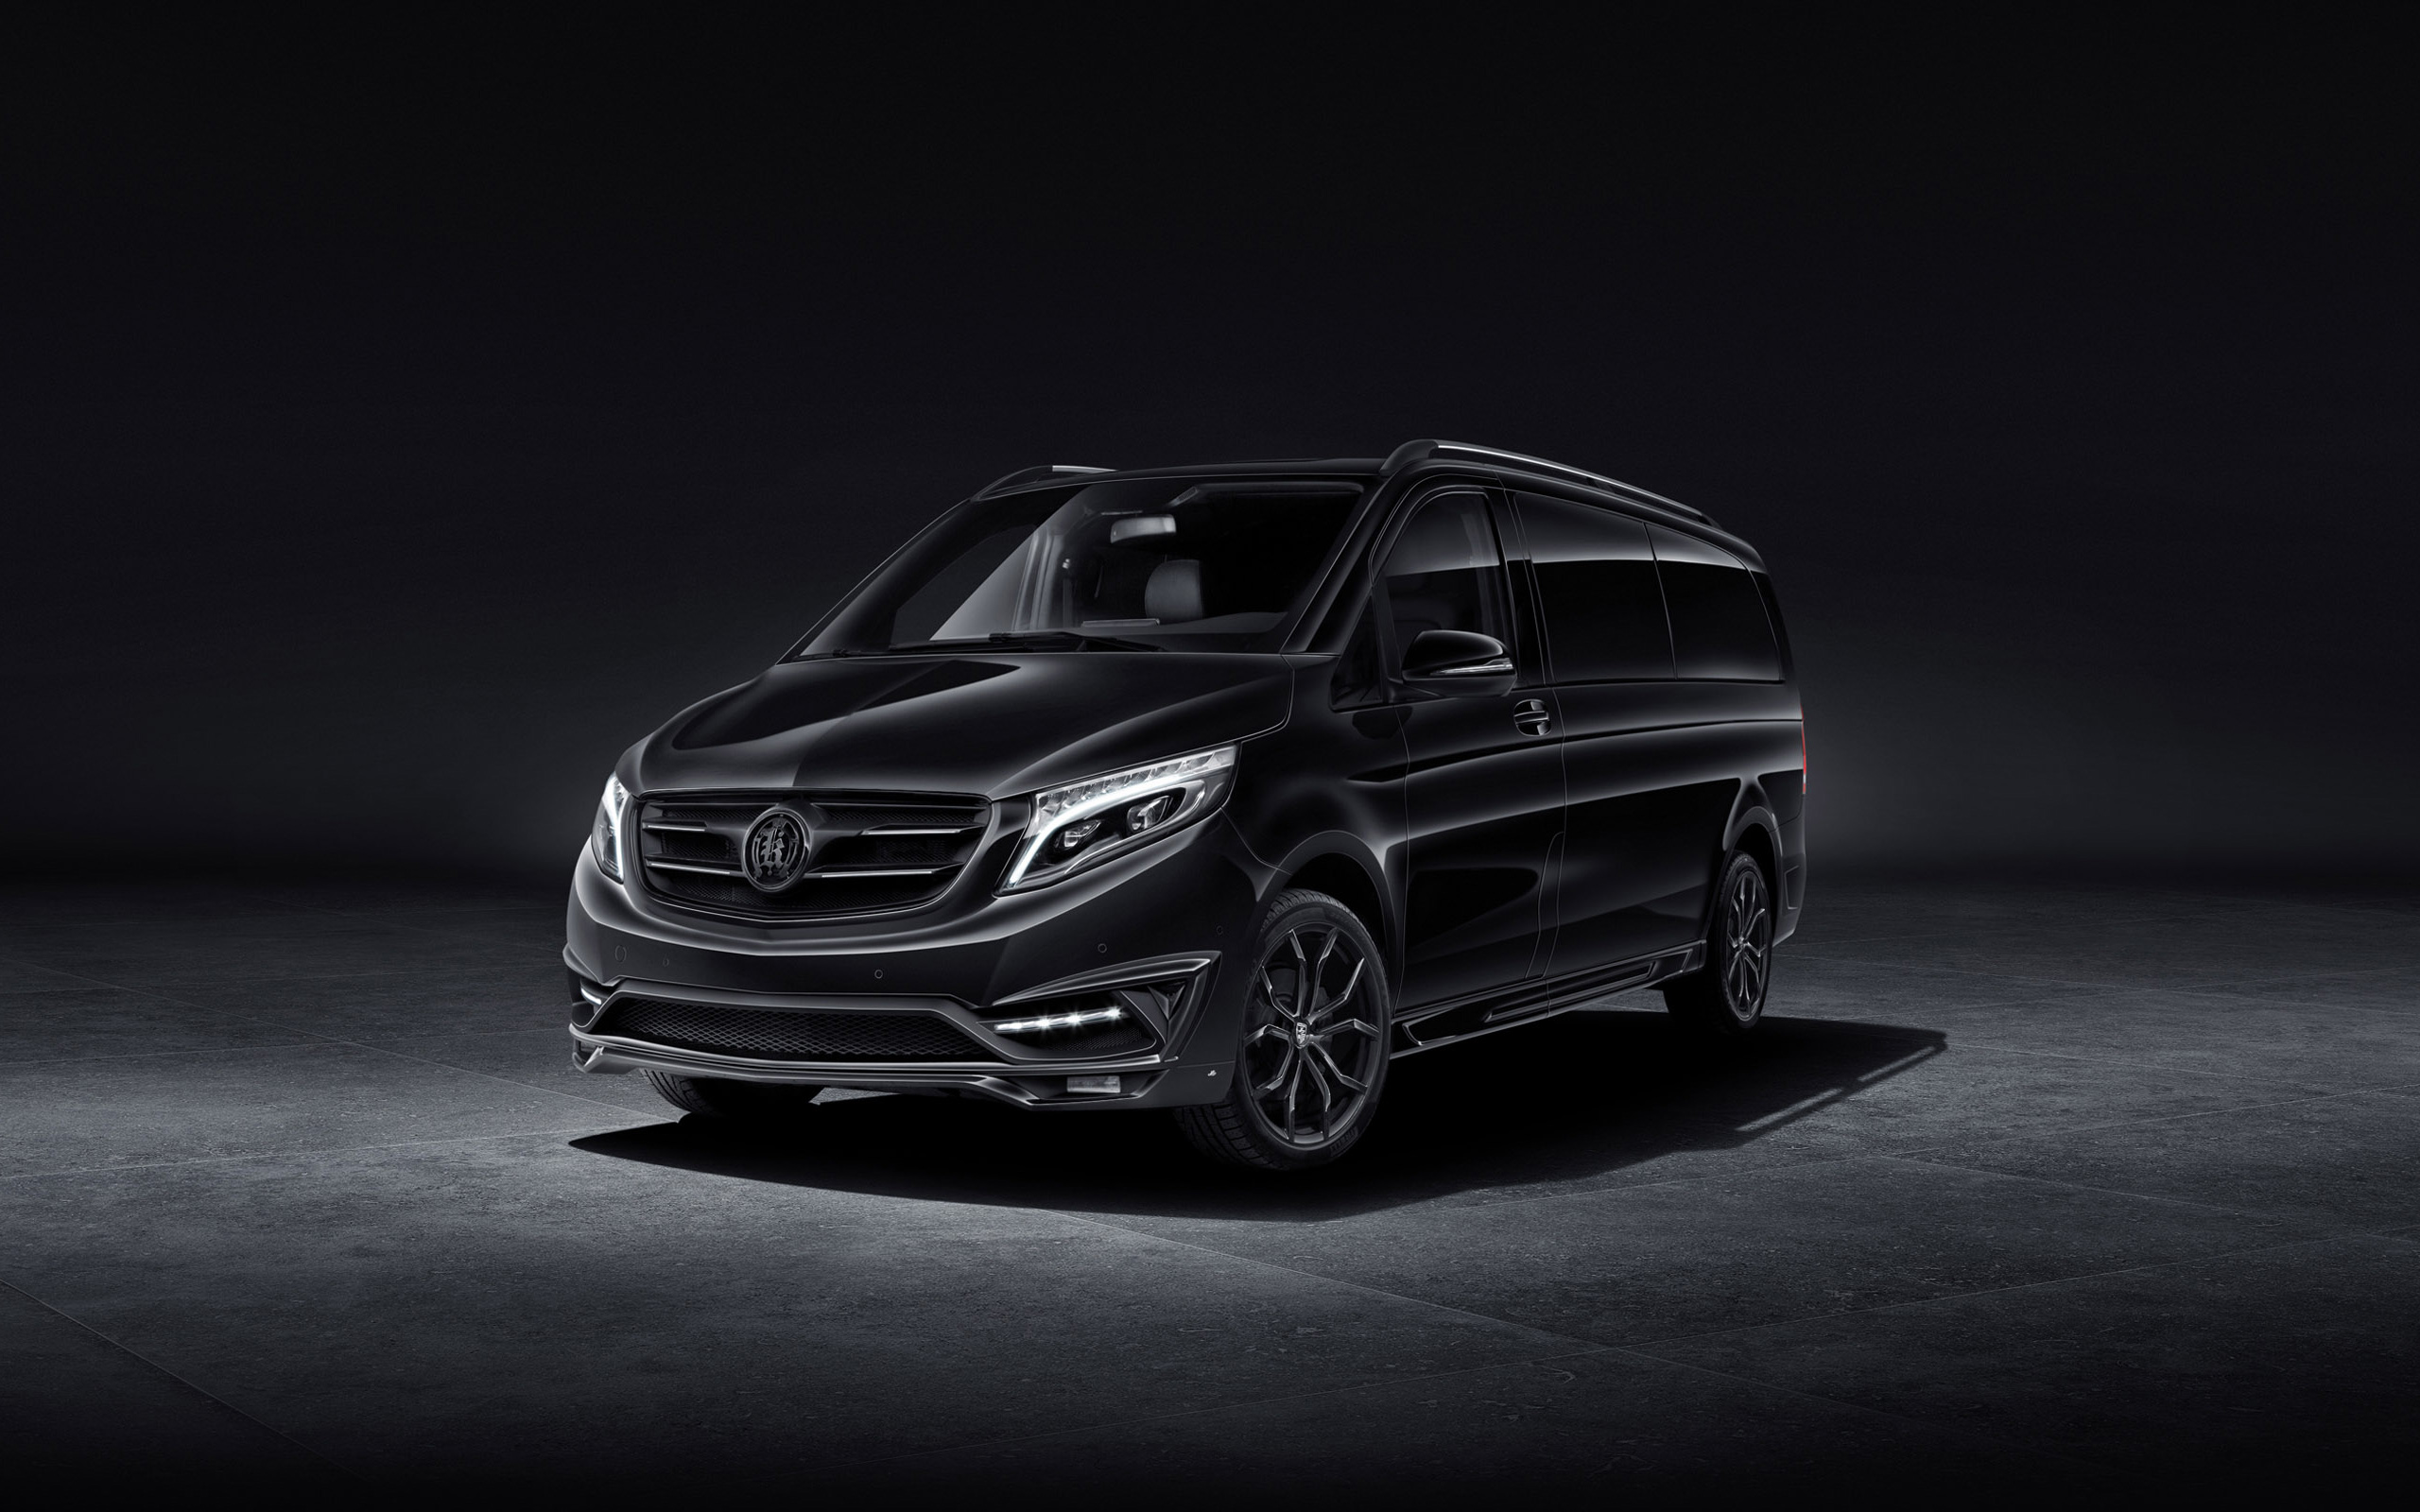 2016 Larte Design Mercedes Benz V Class Black Crystal